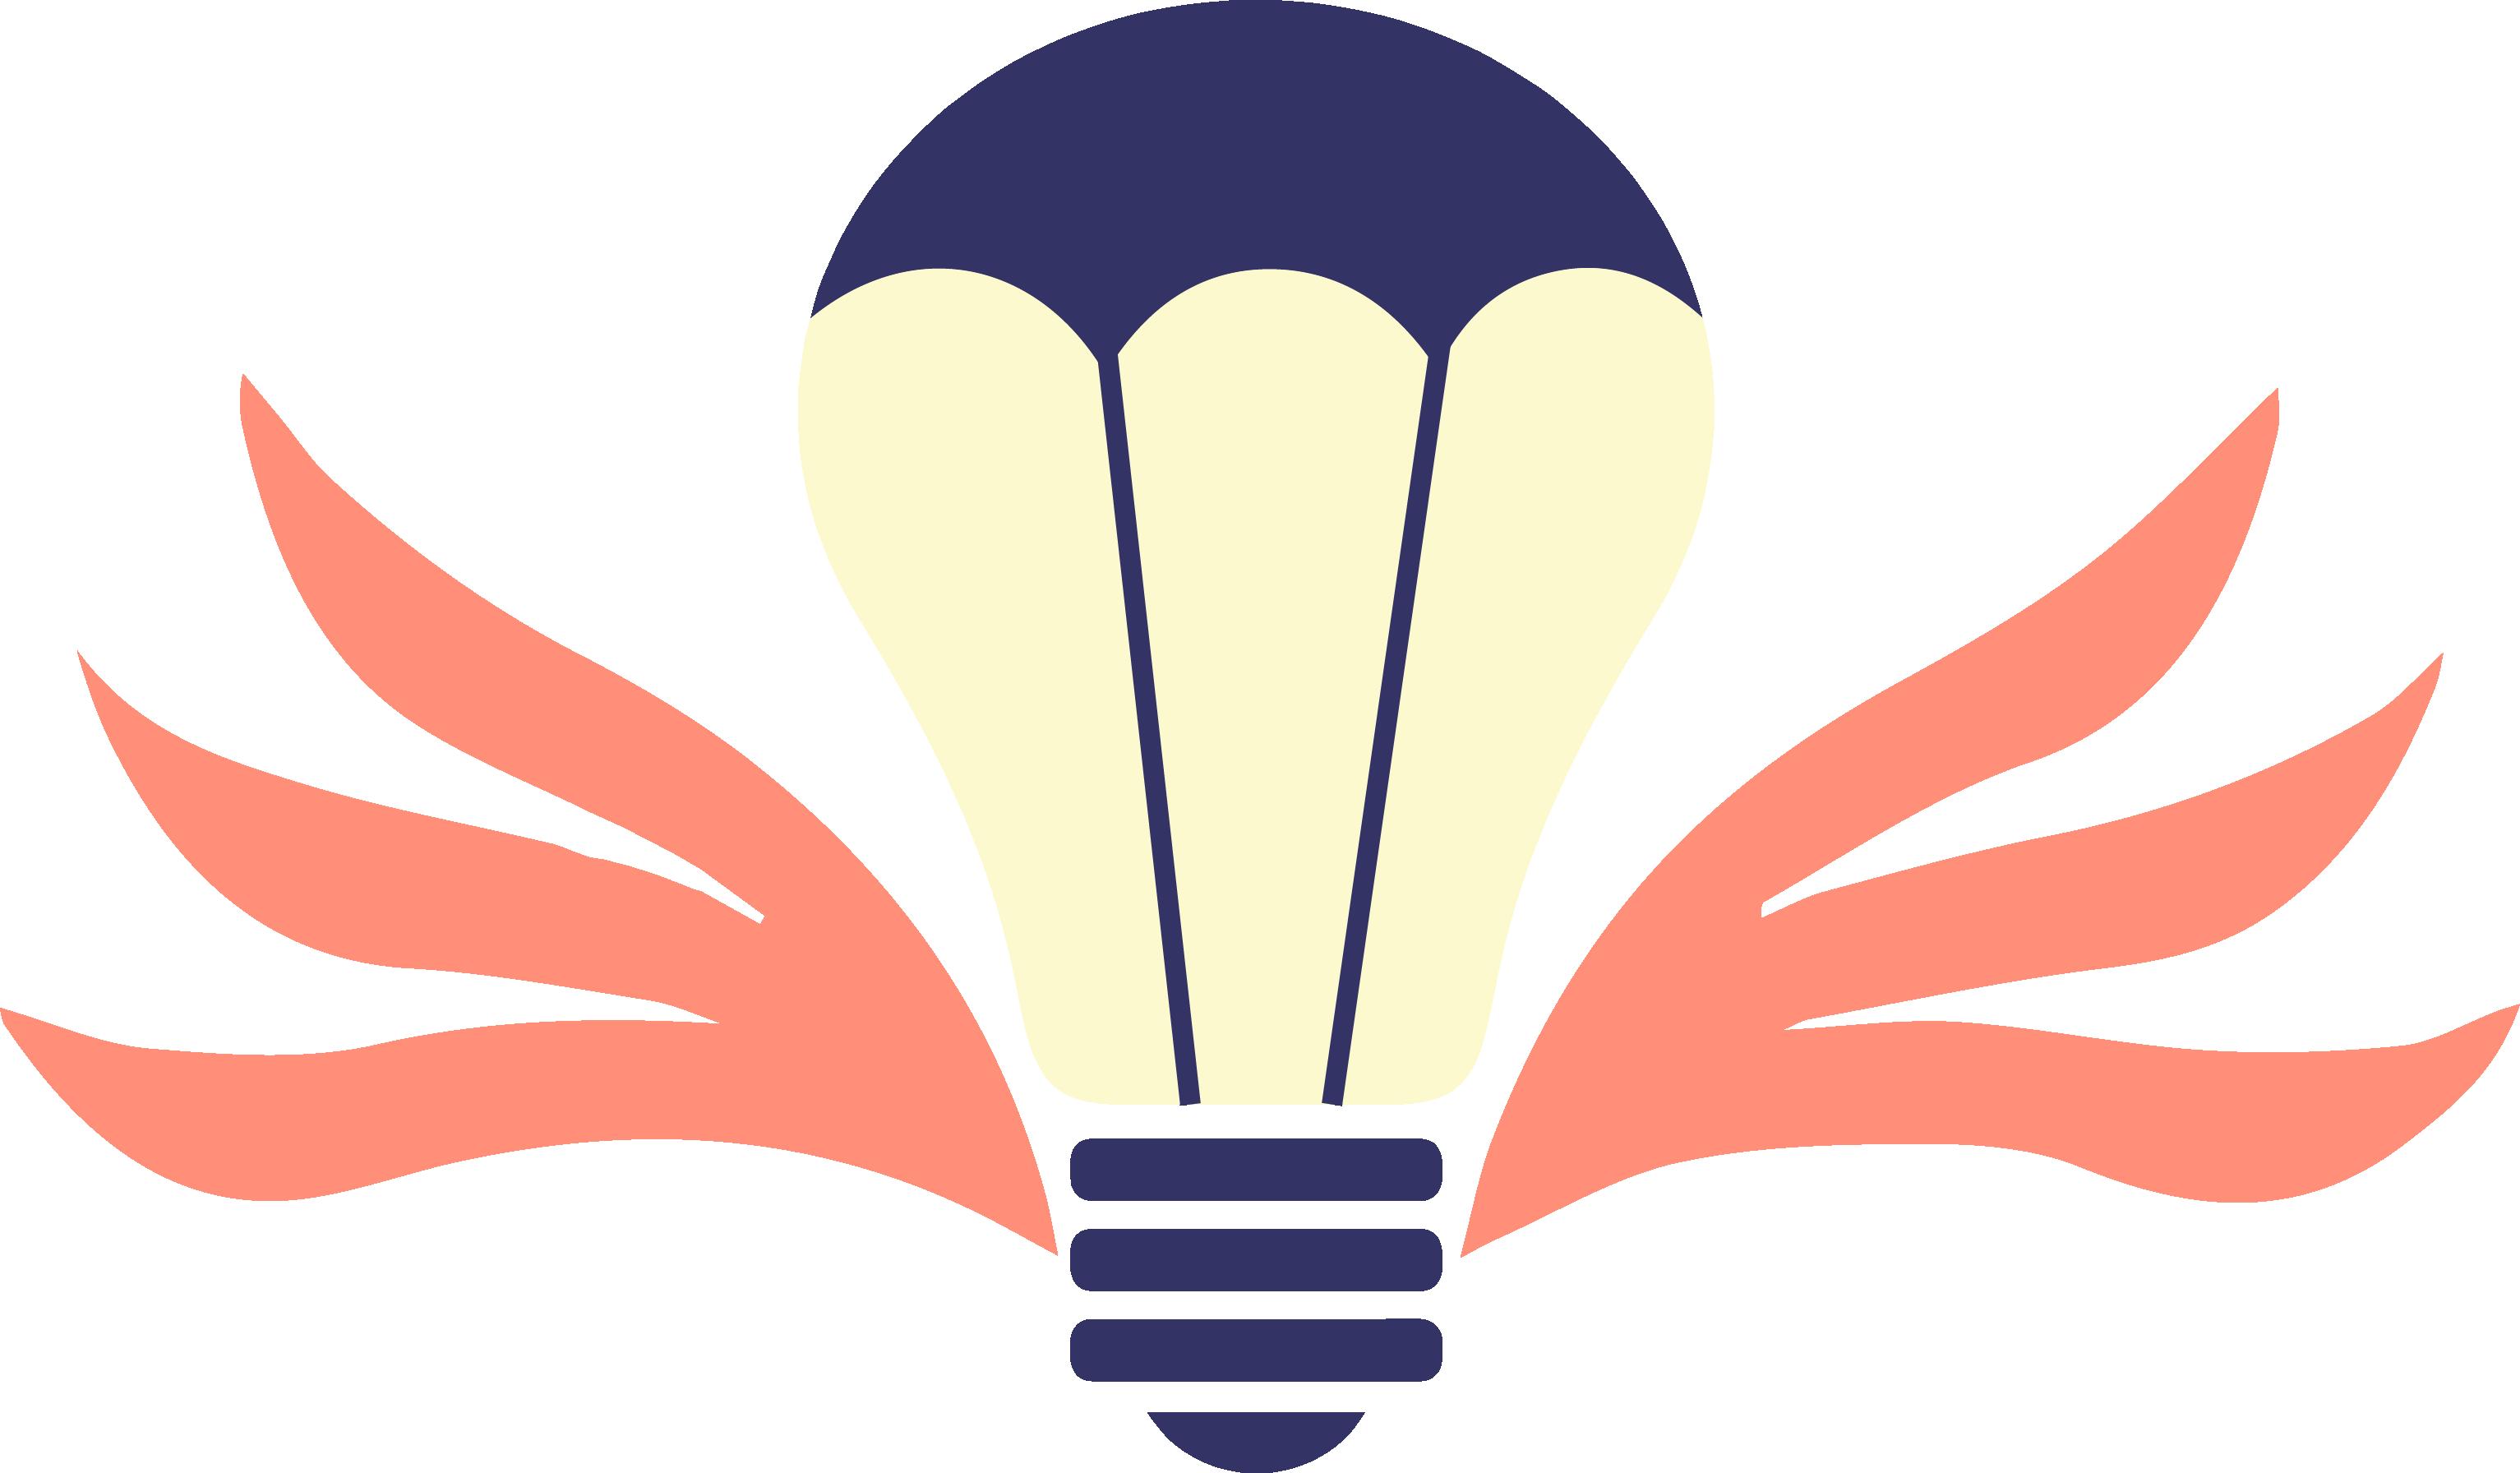 Mind Parachutes